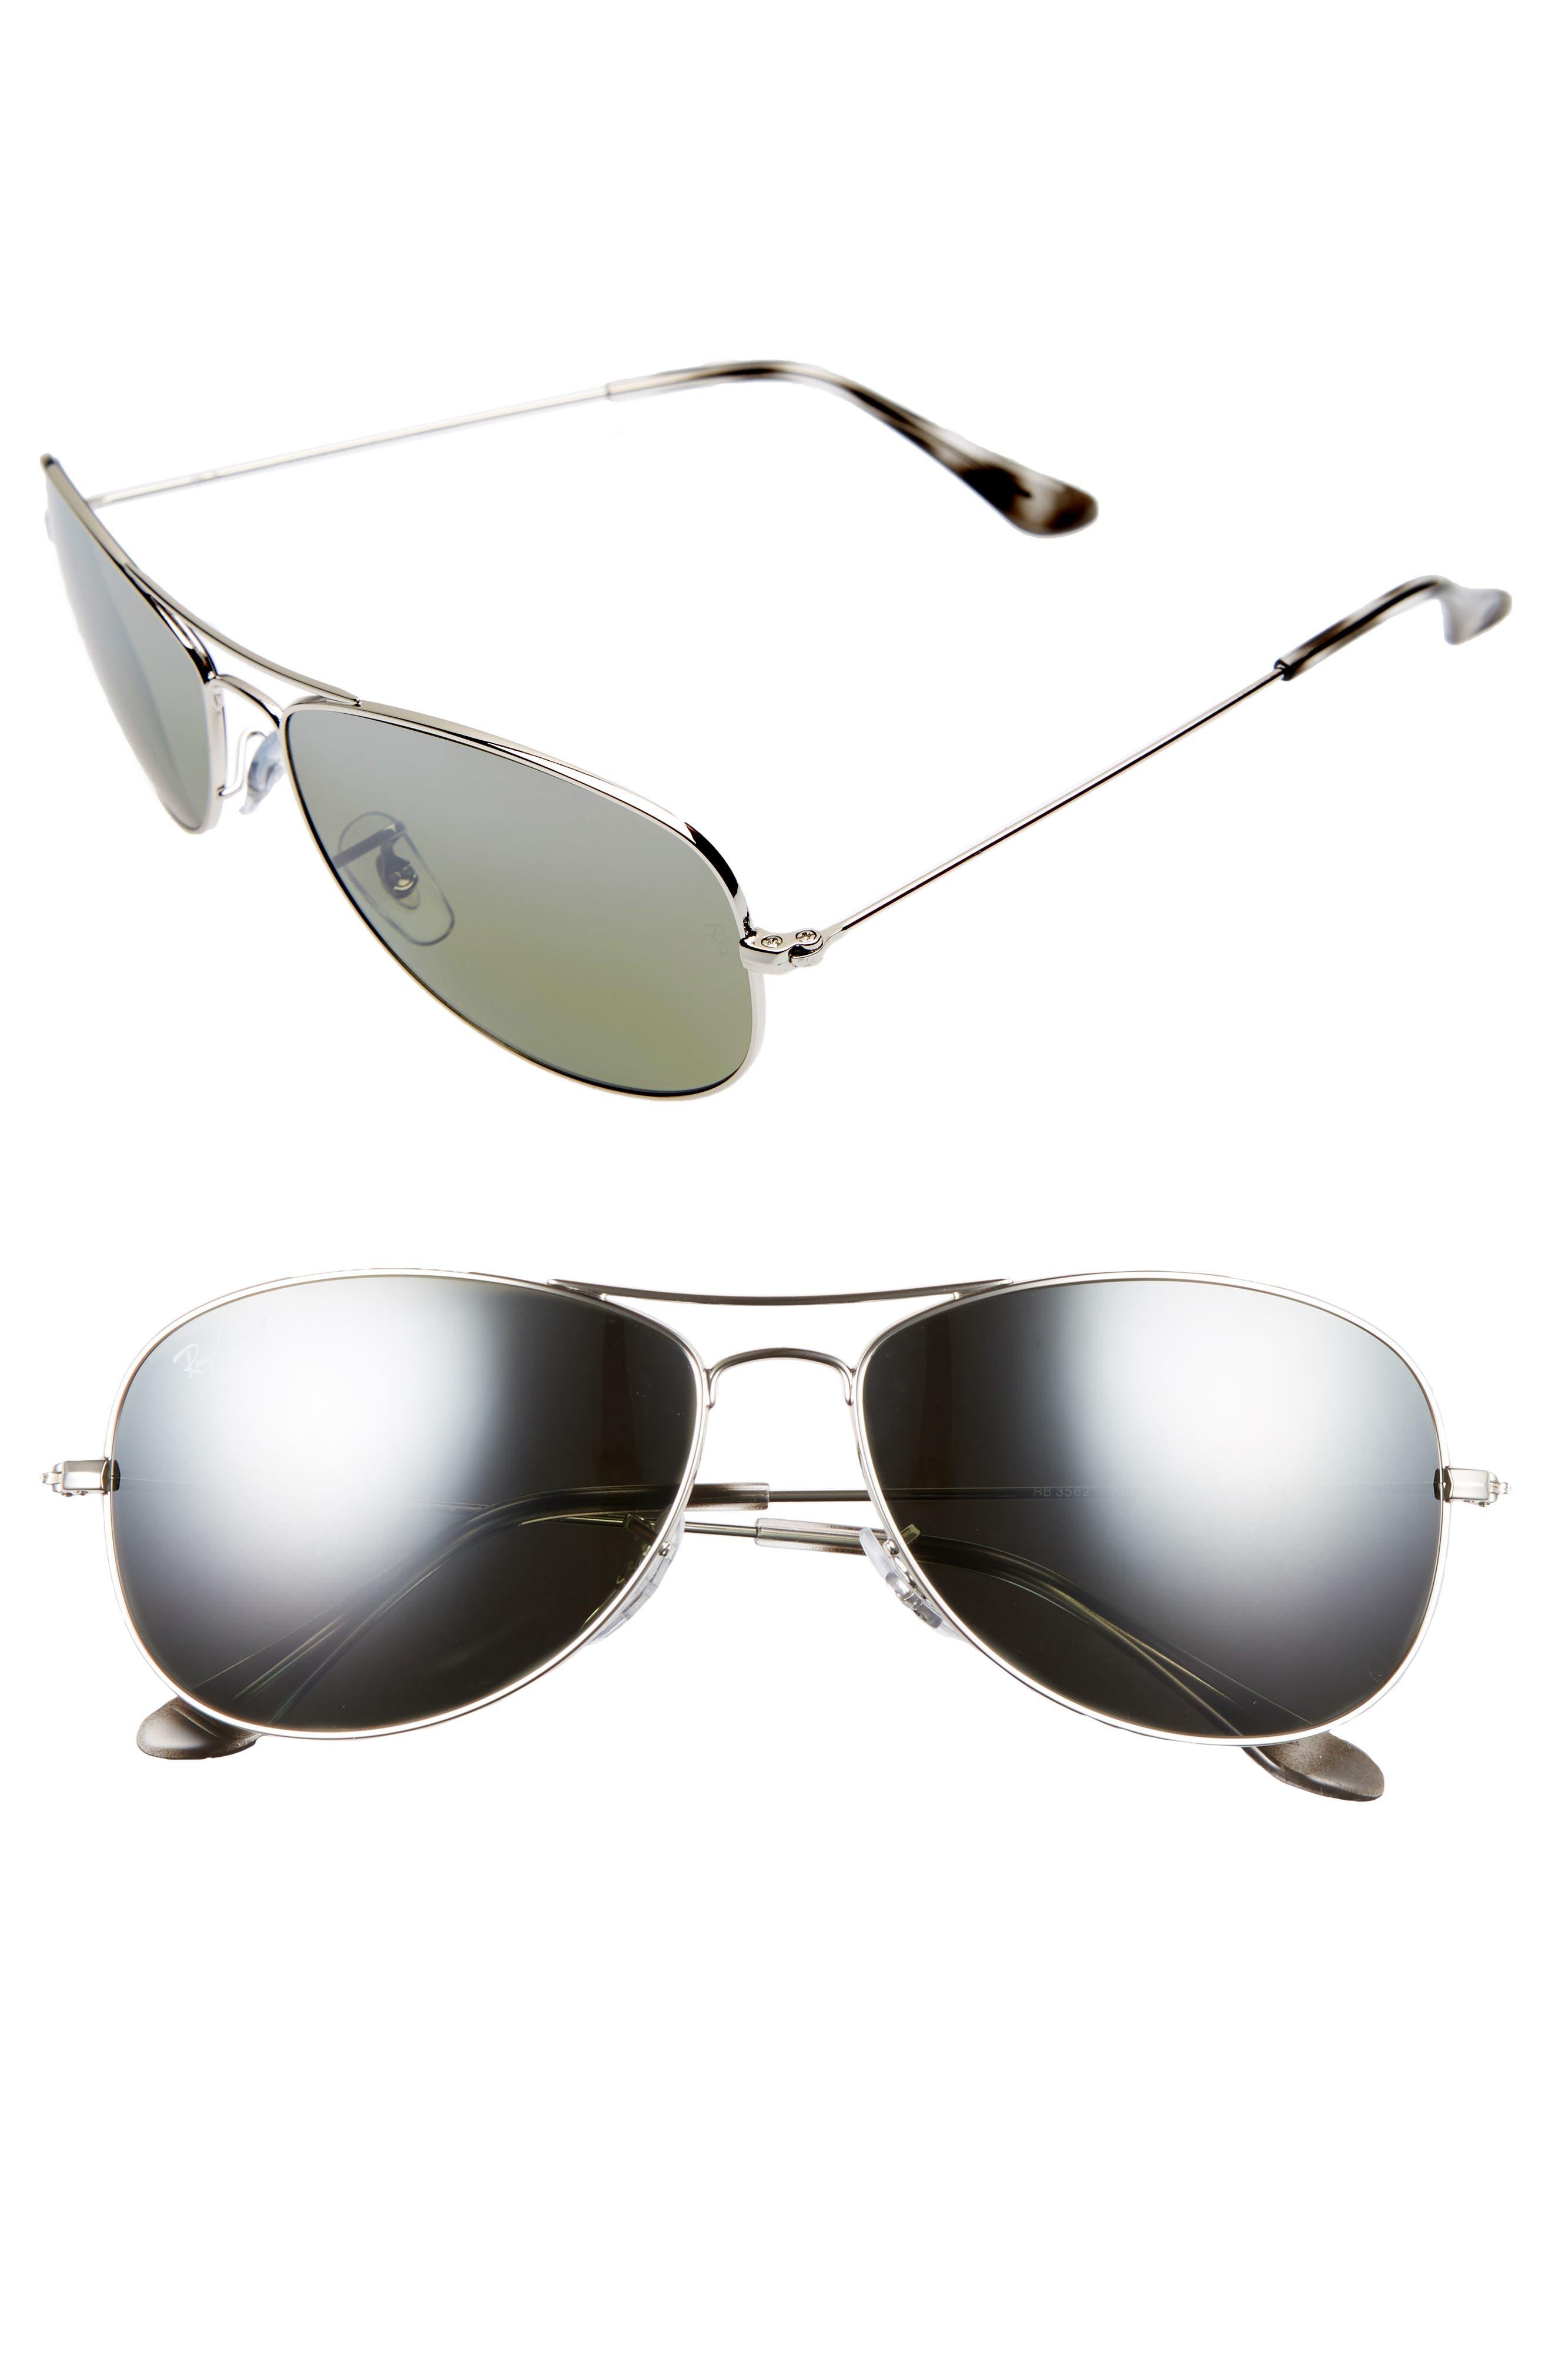 Ray-Ban 5m Polarized Aviator Sunglasses -